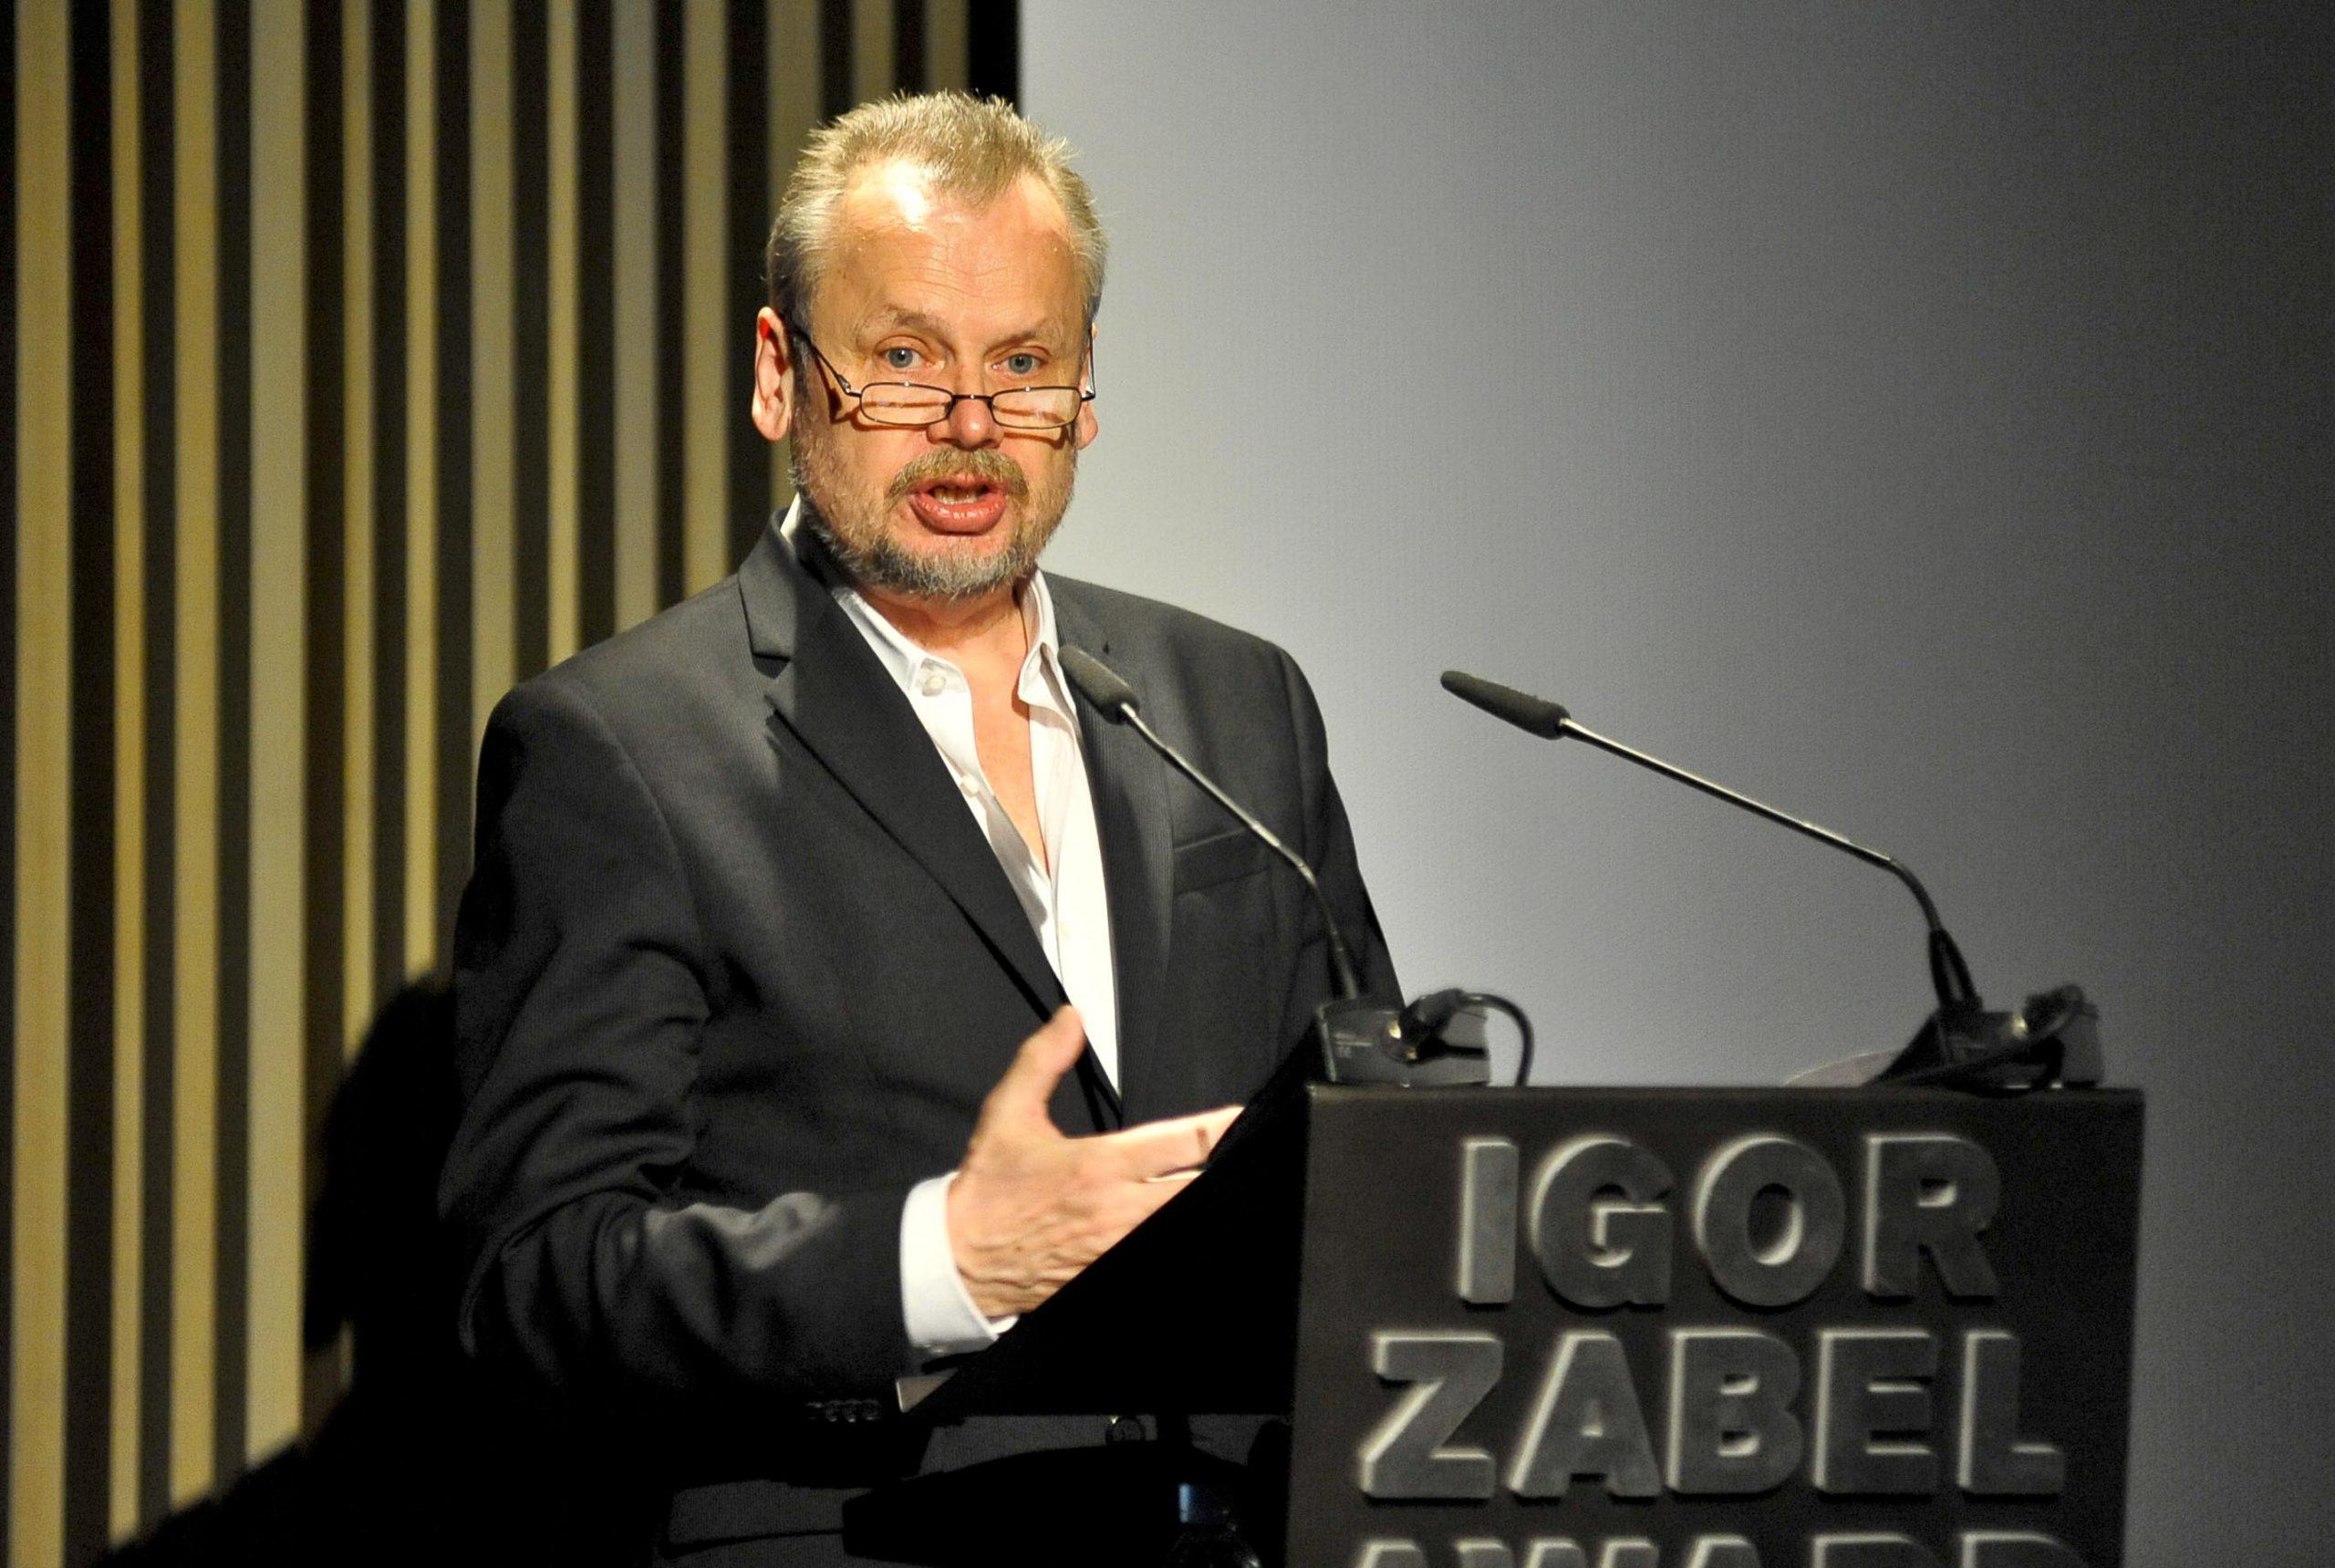 Piotr Piotrowski, winner of the Igor Zabel Award for Culture and Theory 2010. Photo: David Campos